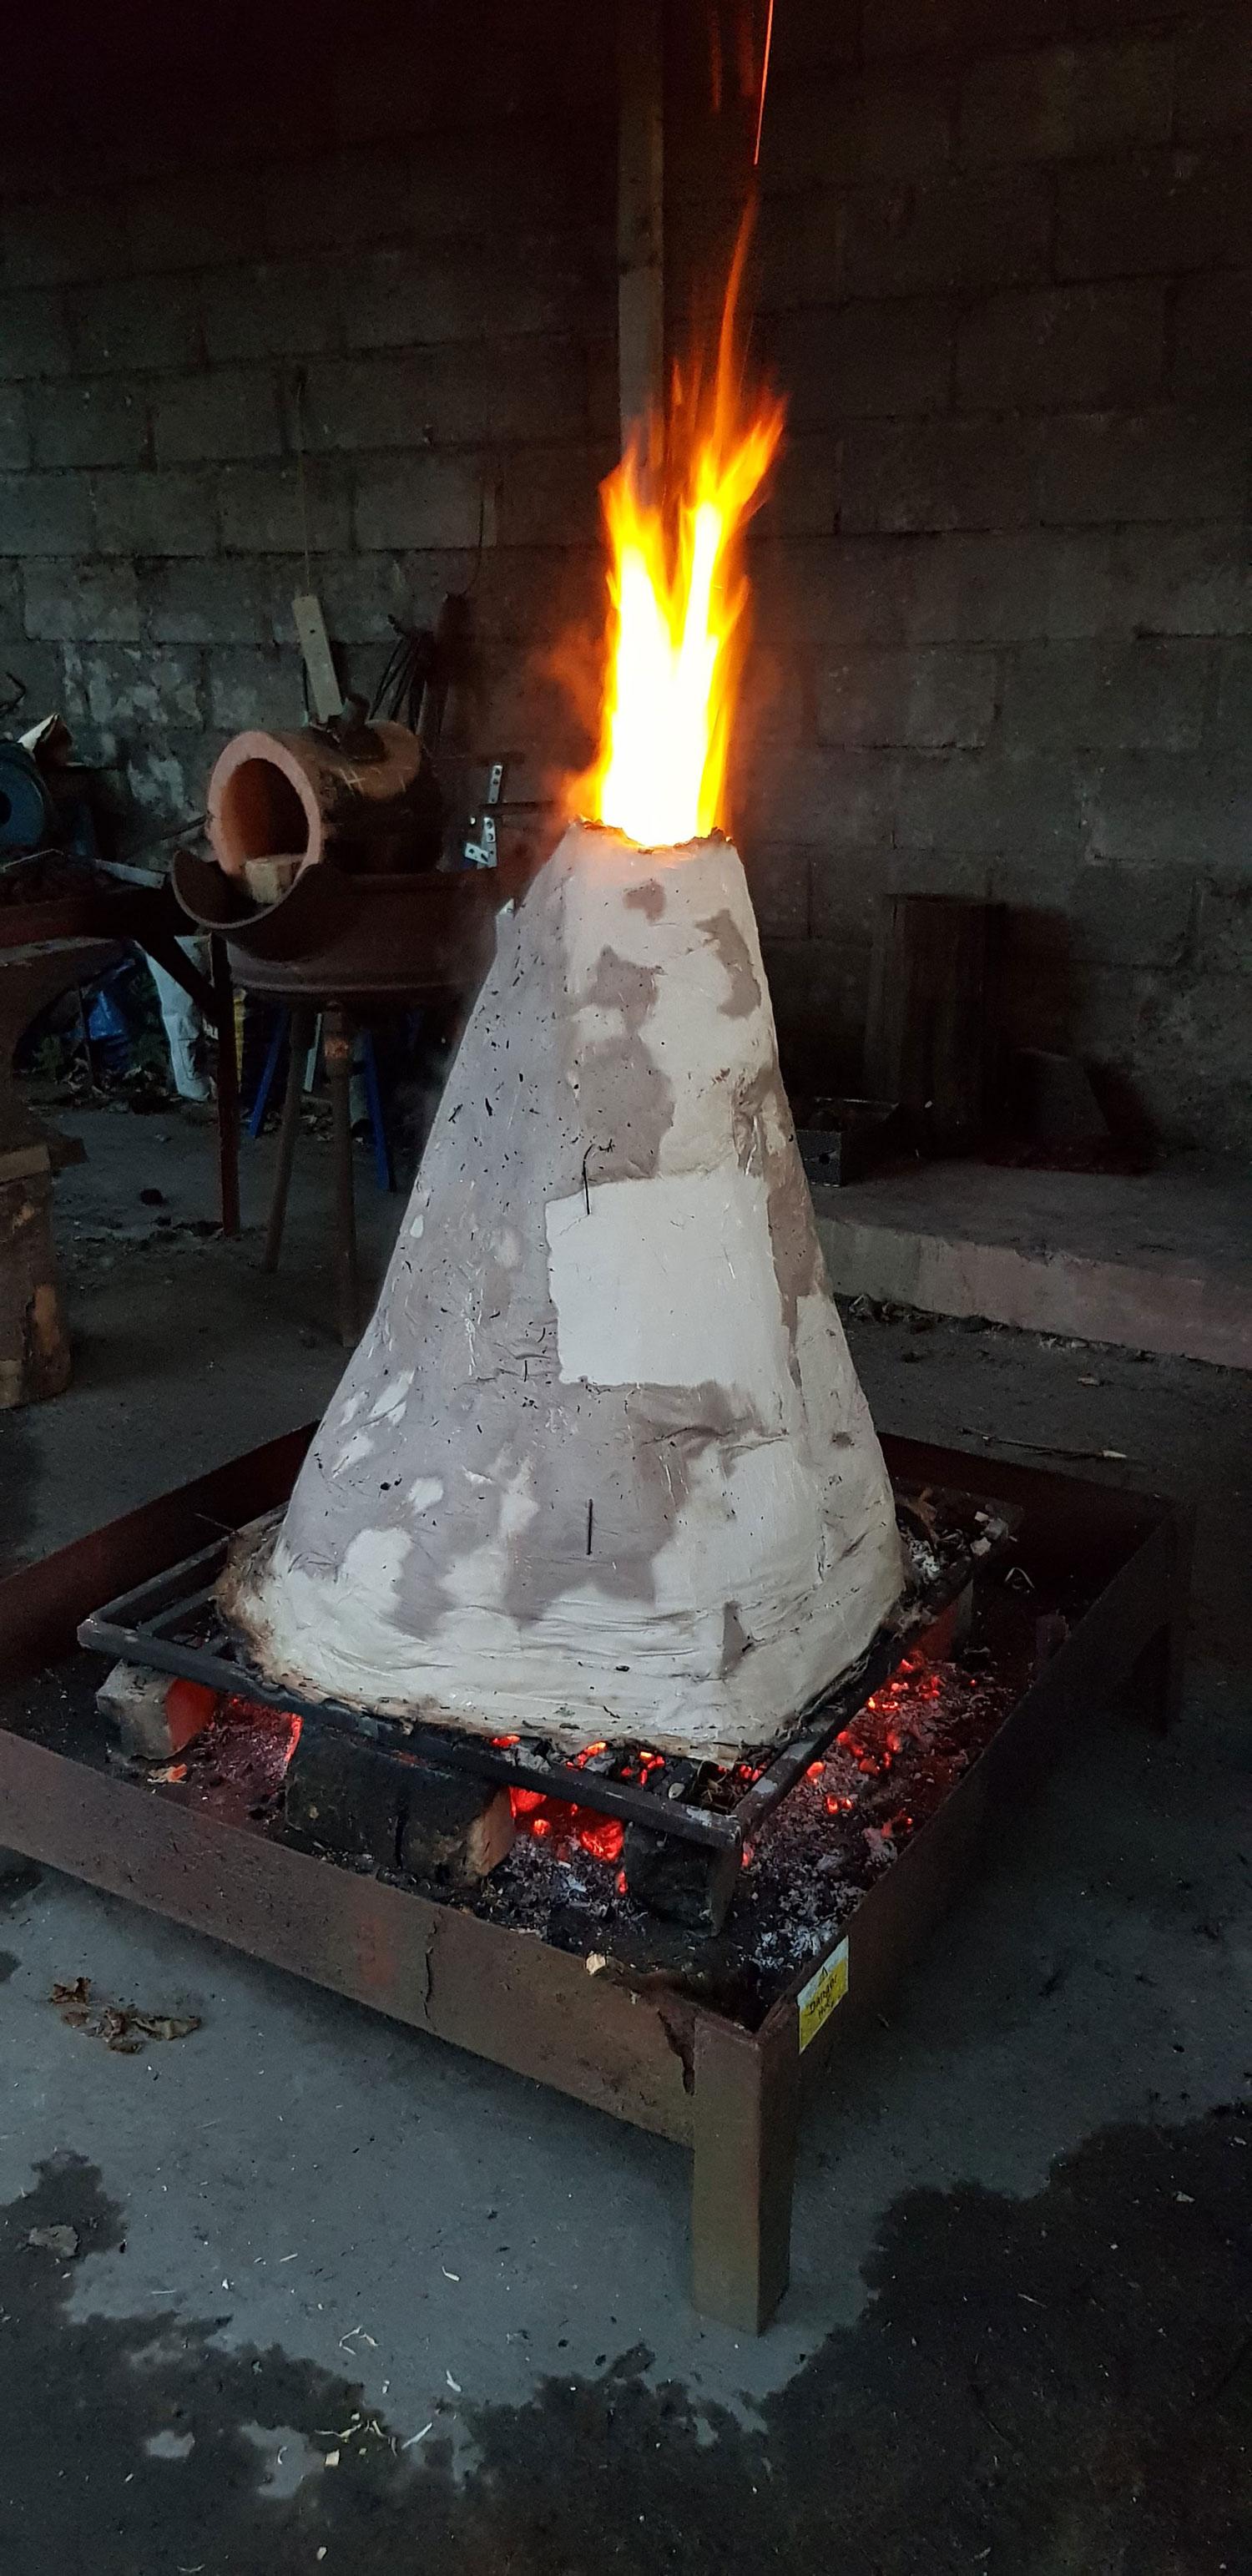 Firing the paper kiln